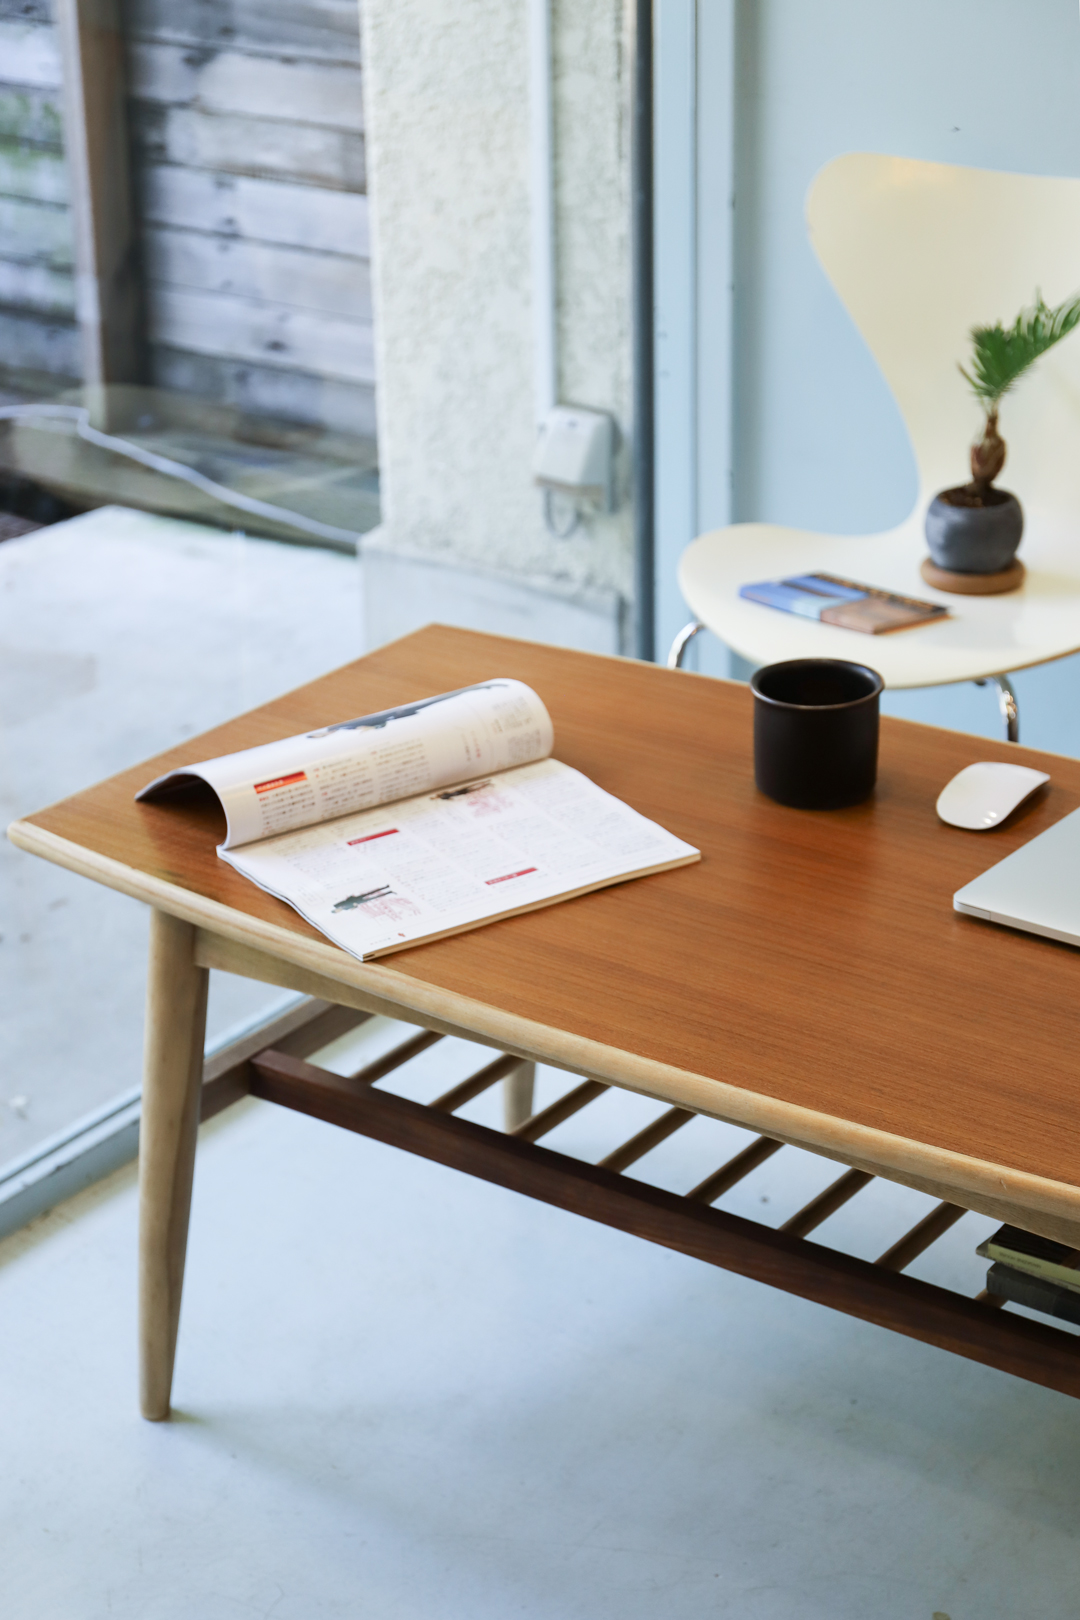 Midcentury Vintage Coffee Table/ヴィンテージ コーヒーテーブル センターテーブル チーク材 レトロ ミッドセンチュリー 北欧デザイン